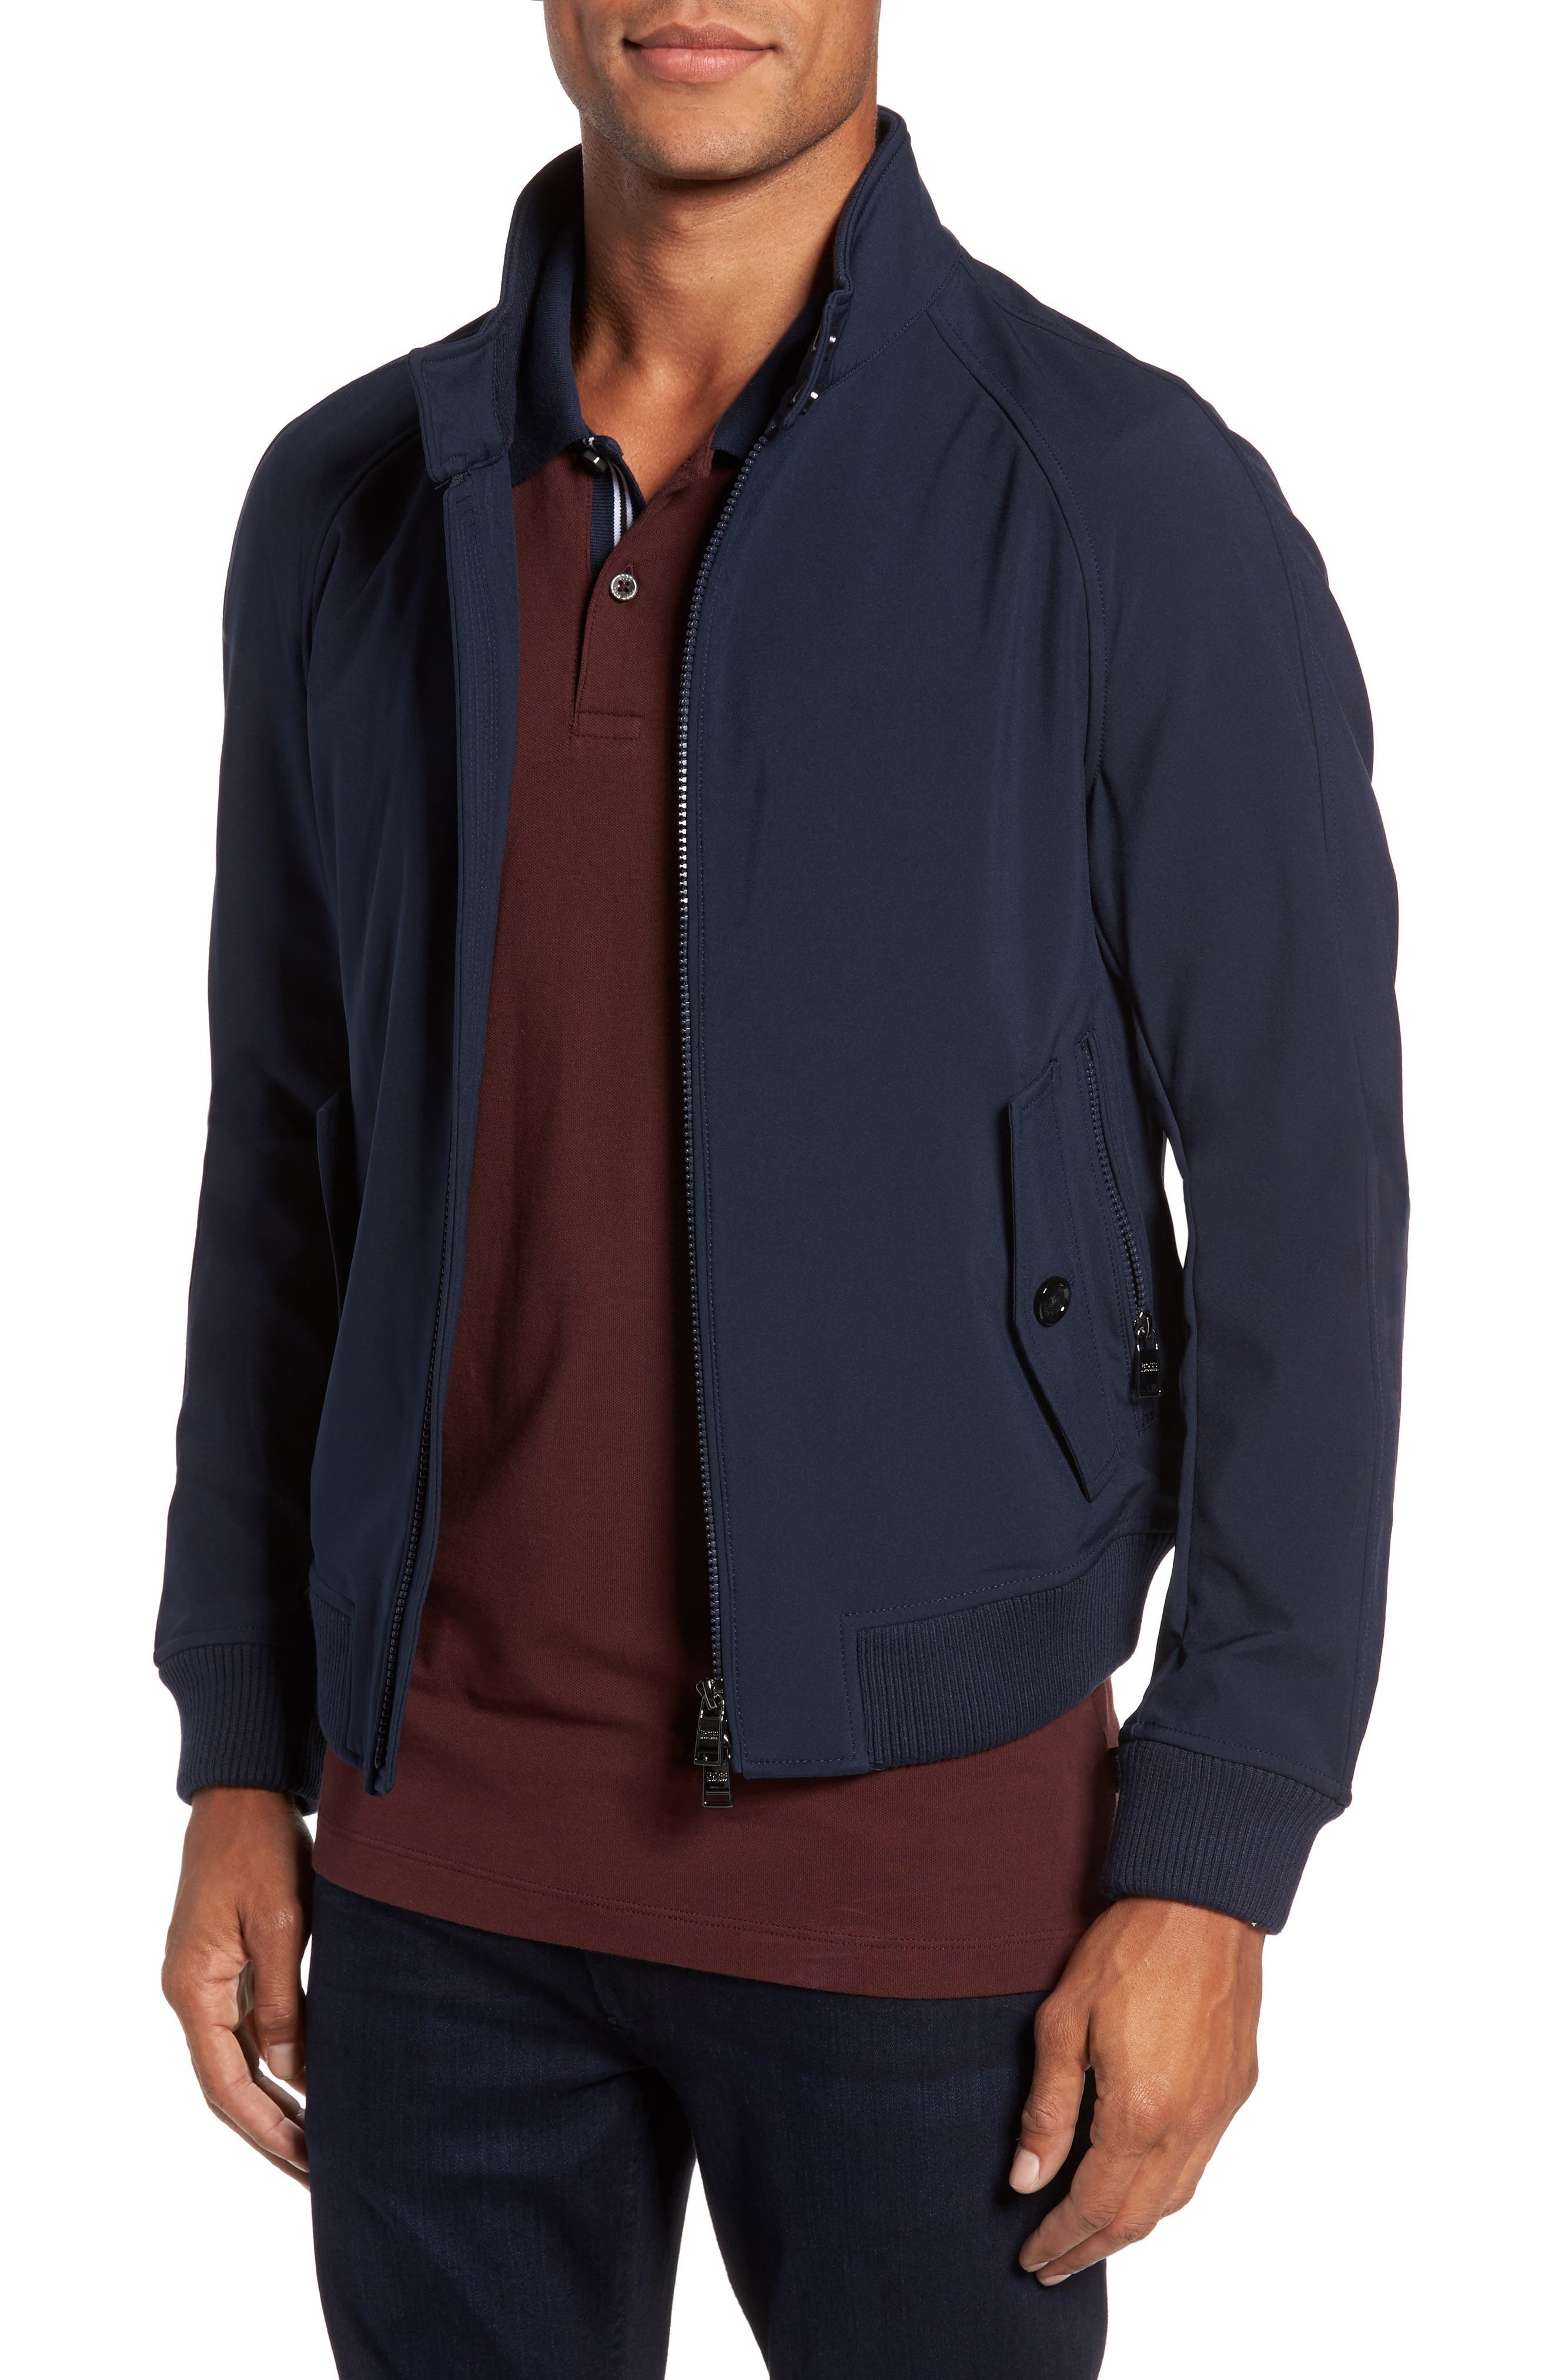 Alternate Image 1 Selected - BOSS Corva Technical Jacket